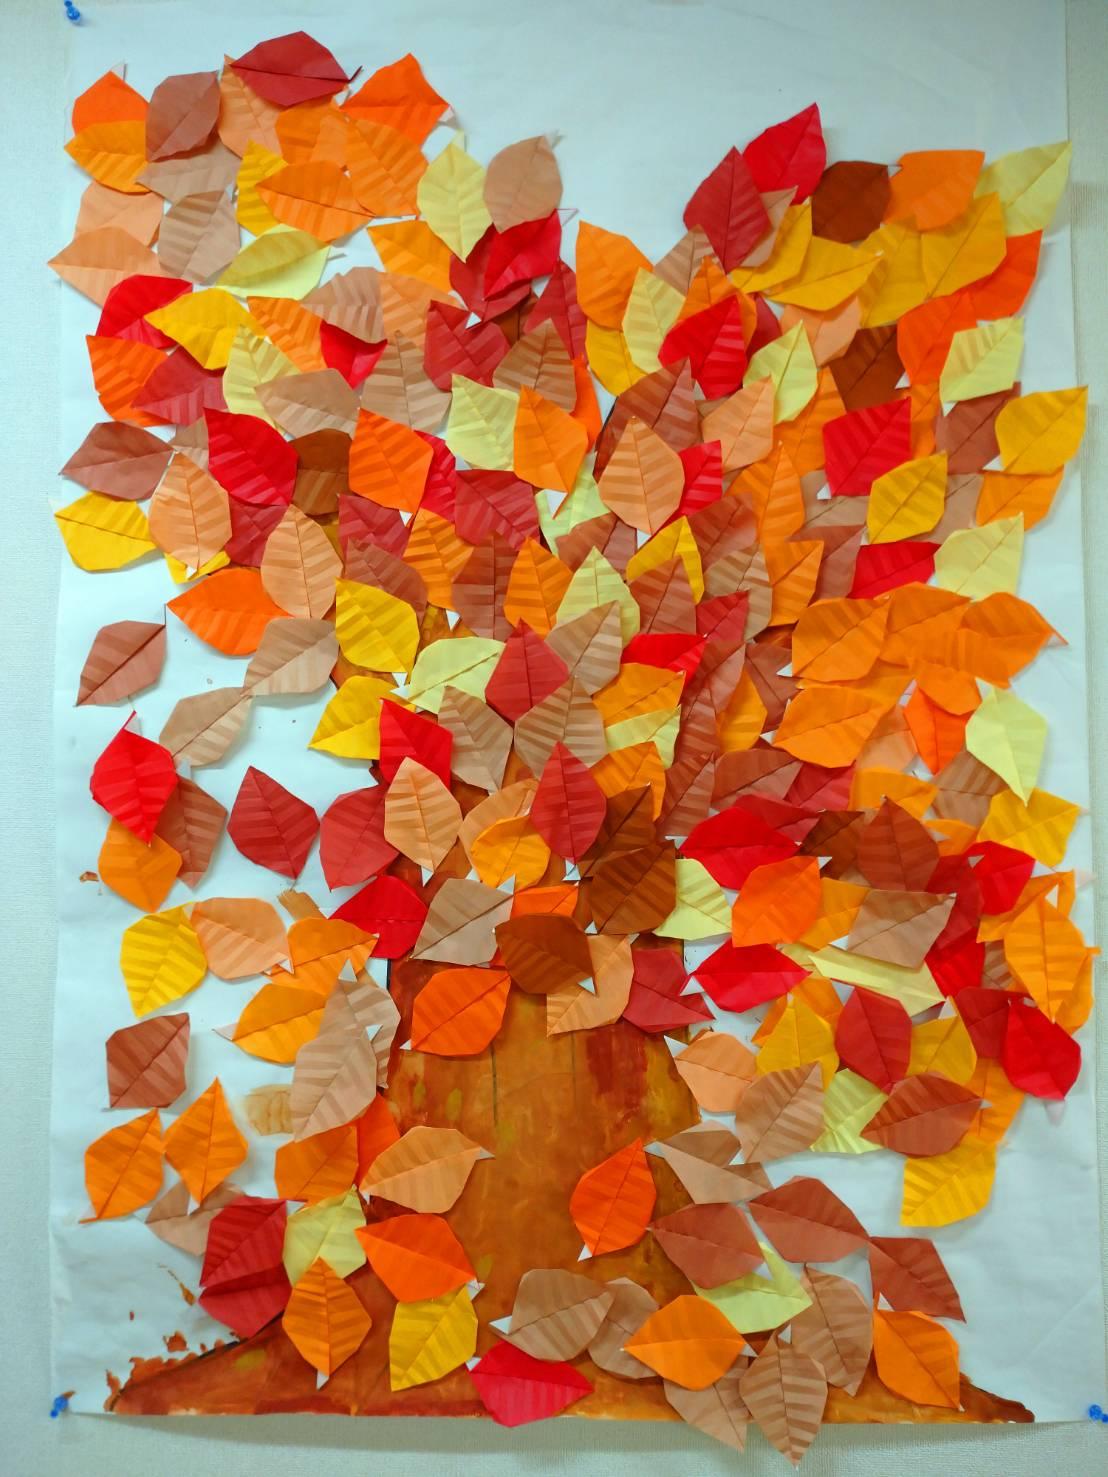 2021年10月17日「秋の壁画制作」